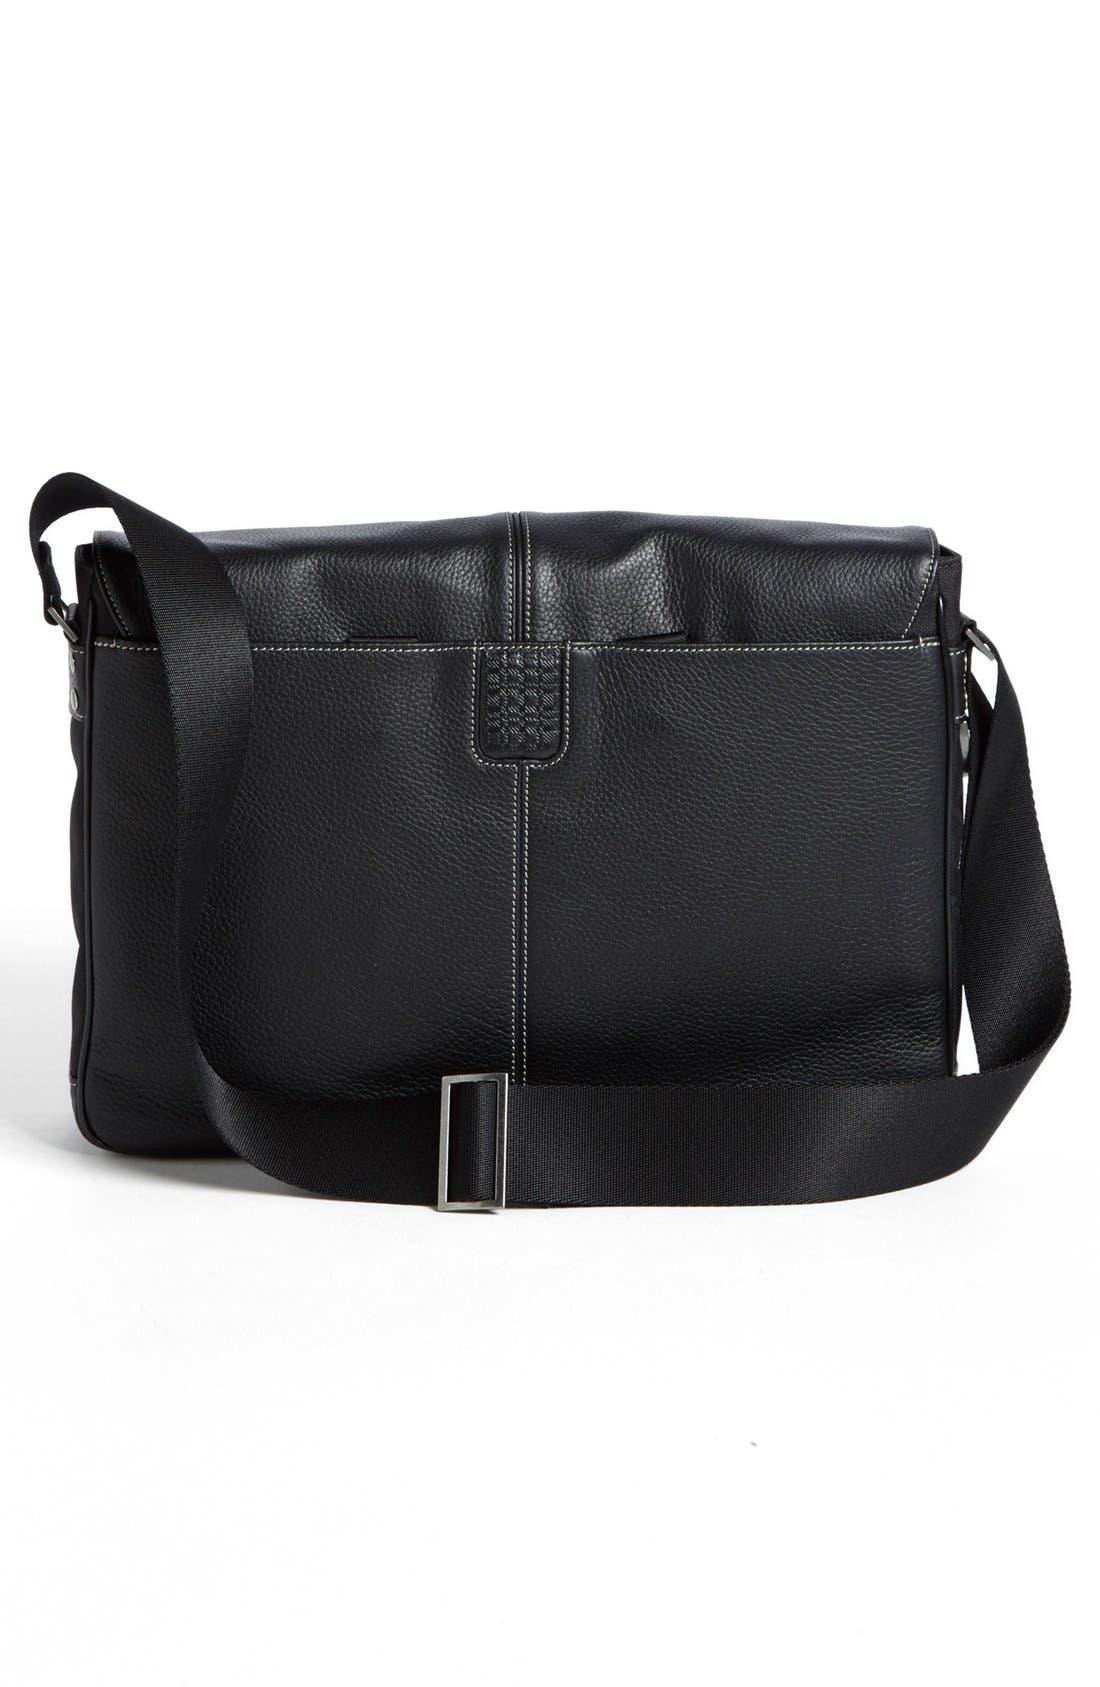 Tyler Slim Leather Laptop Briefcase,                             Alternate thumbnail 3, color,                             BLACK/ KHAKI